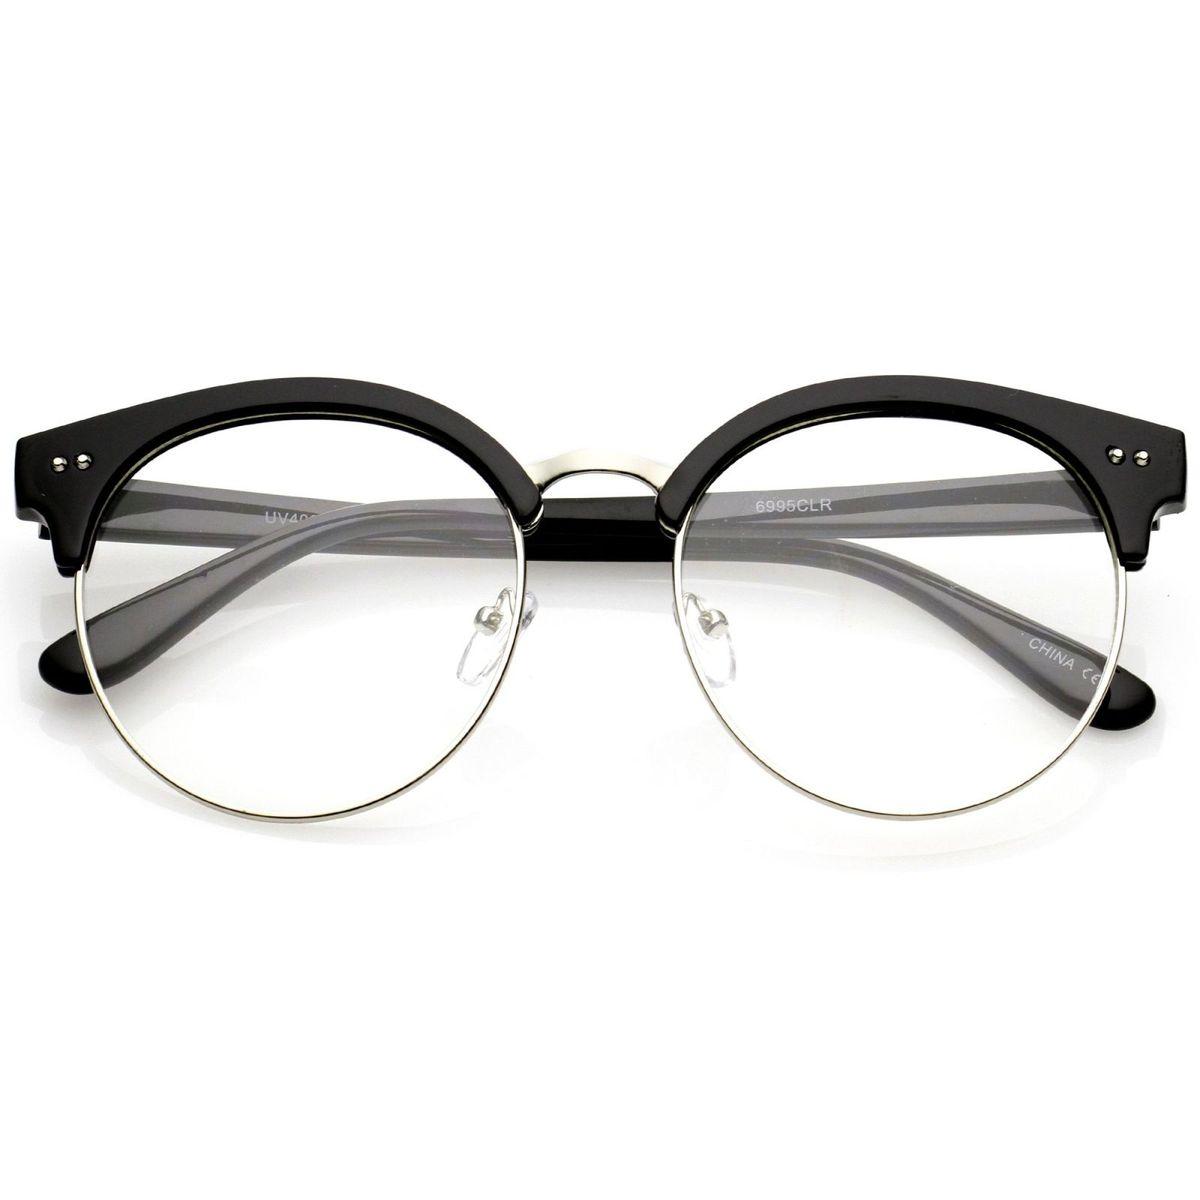 013ed2c74 Óculos Geek - Vintage com Lentes sem Grau - Nerd - Wayfarer - Unissex |  Óculos Masculino Nunca Usado 23622939 | enjoei